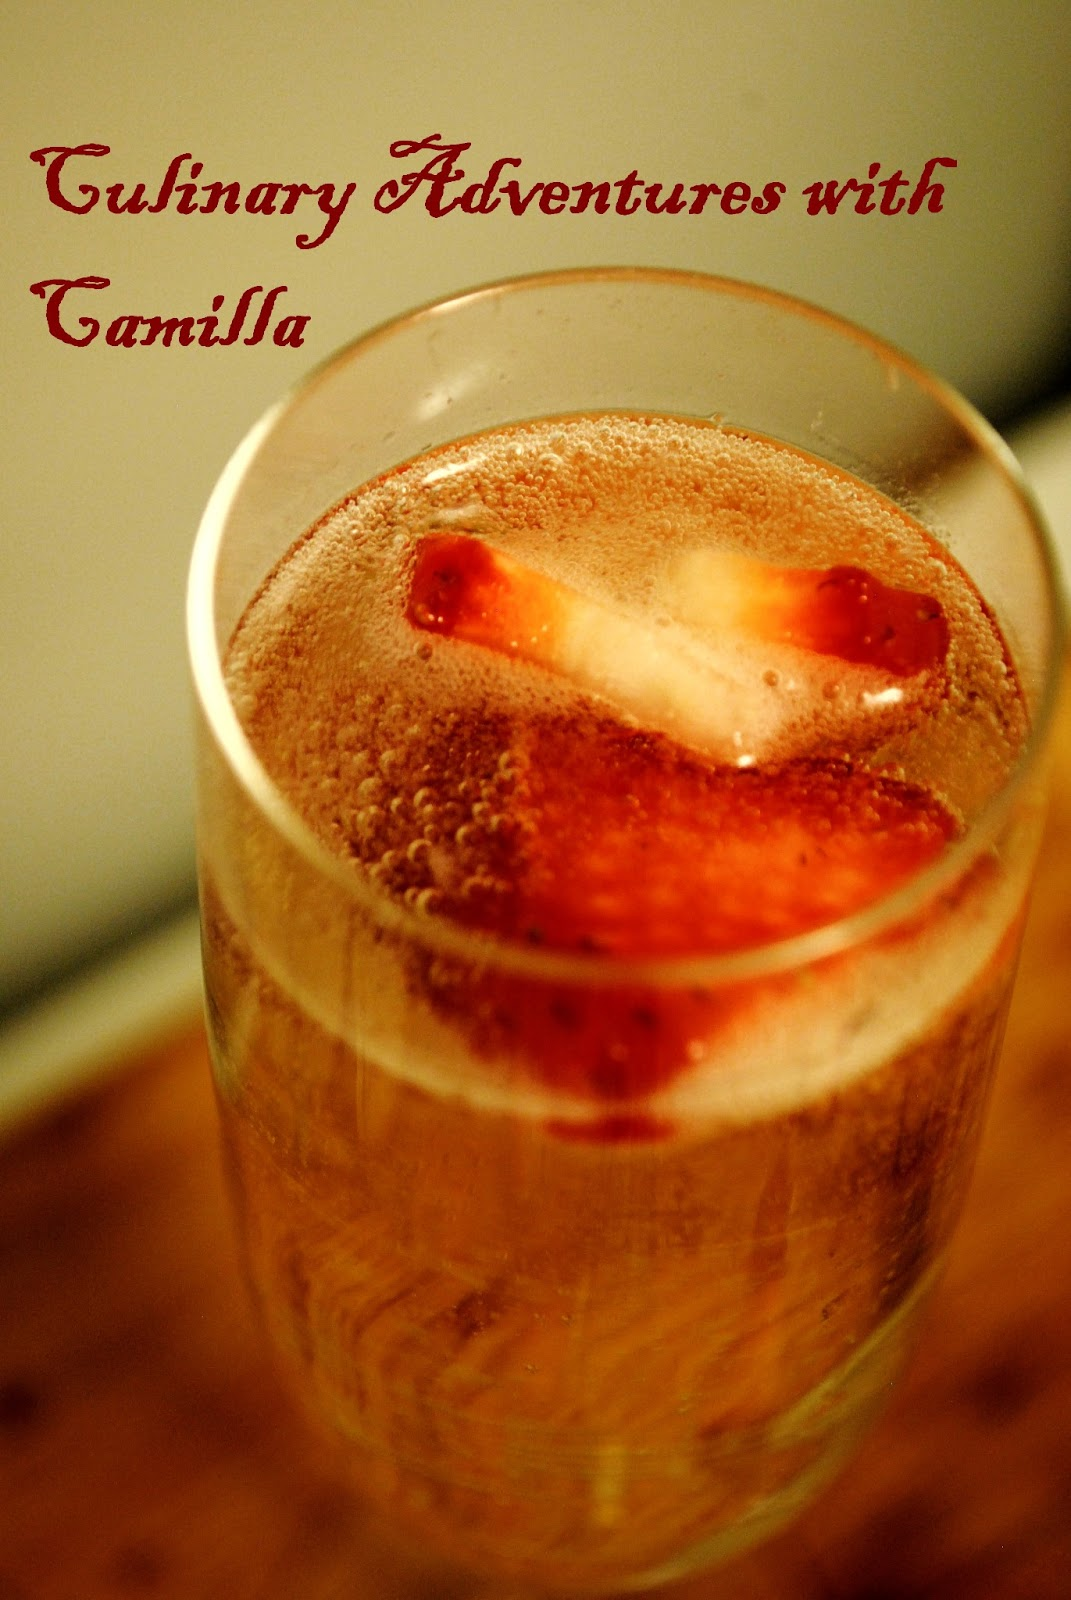 culinary adventures with camilla brunchweek st germain